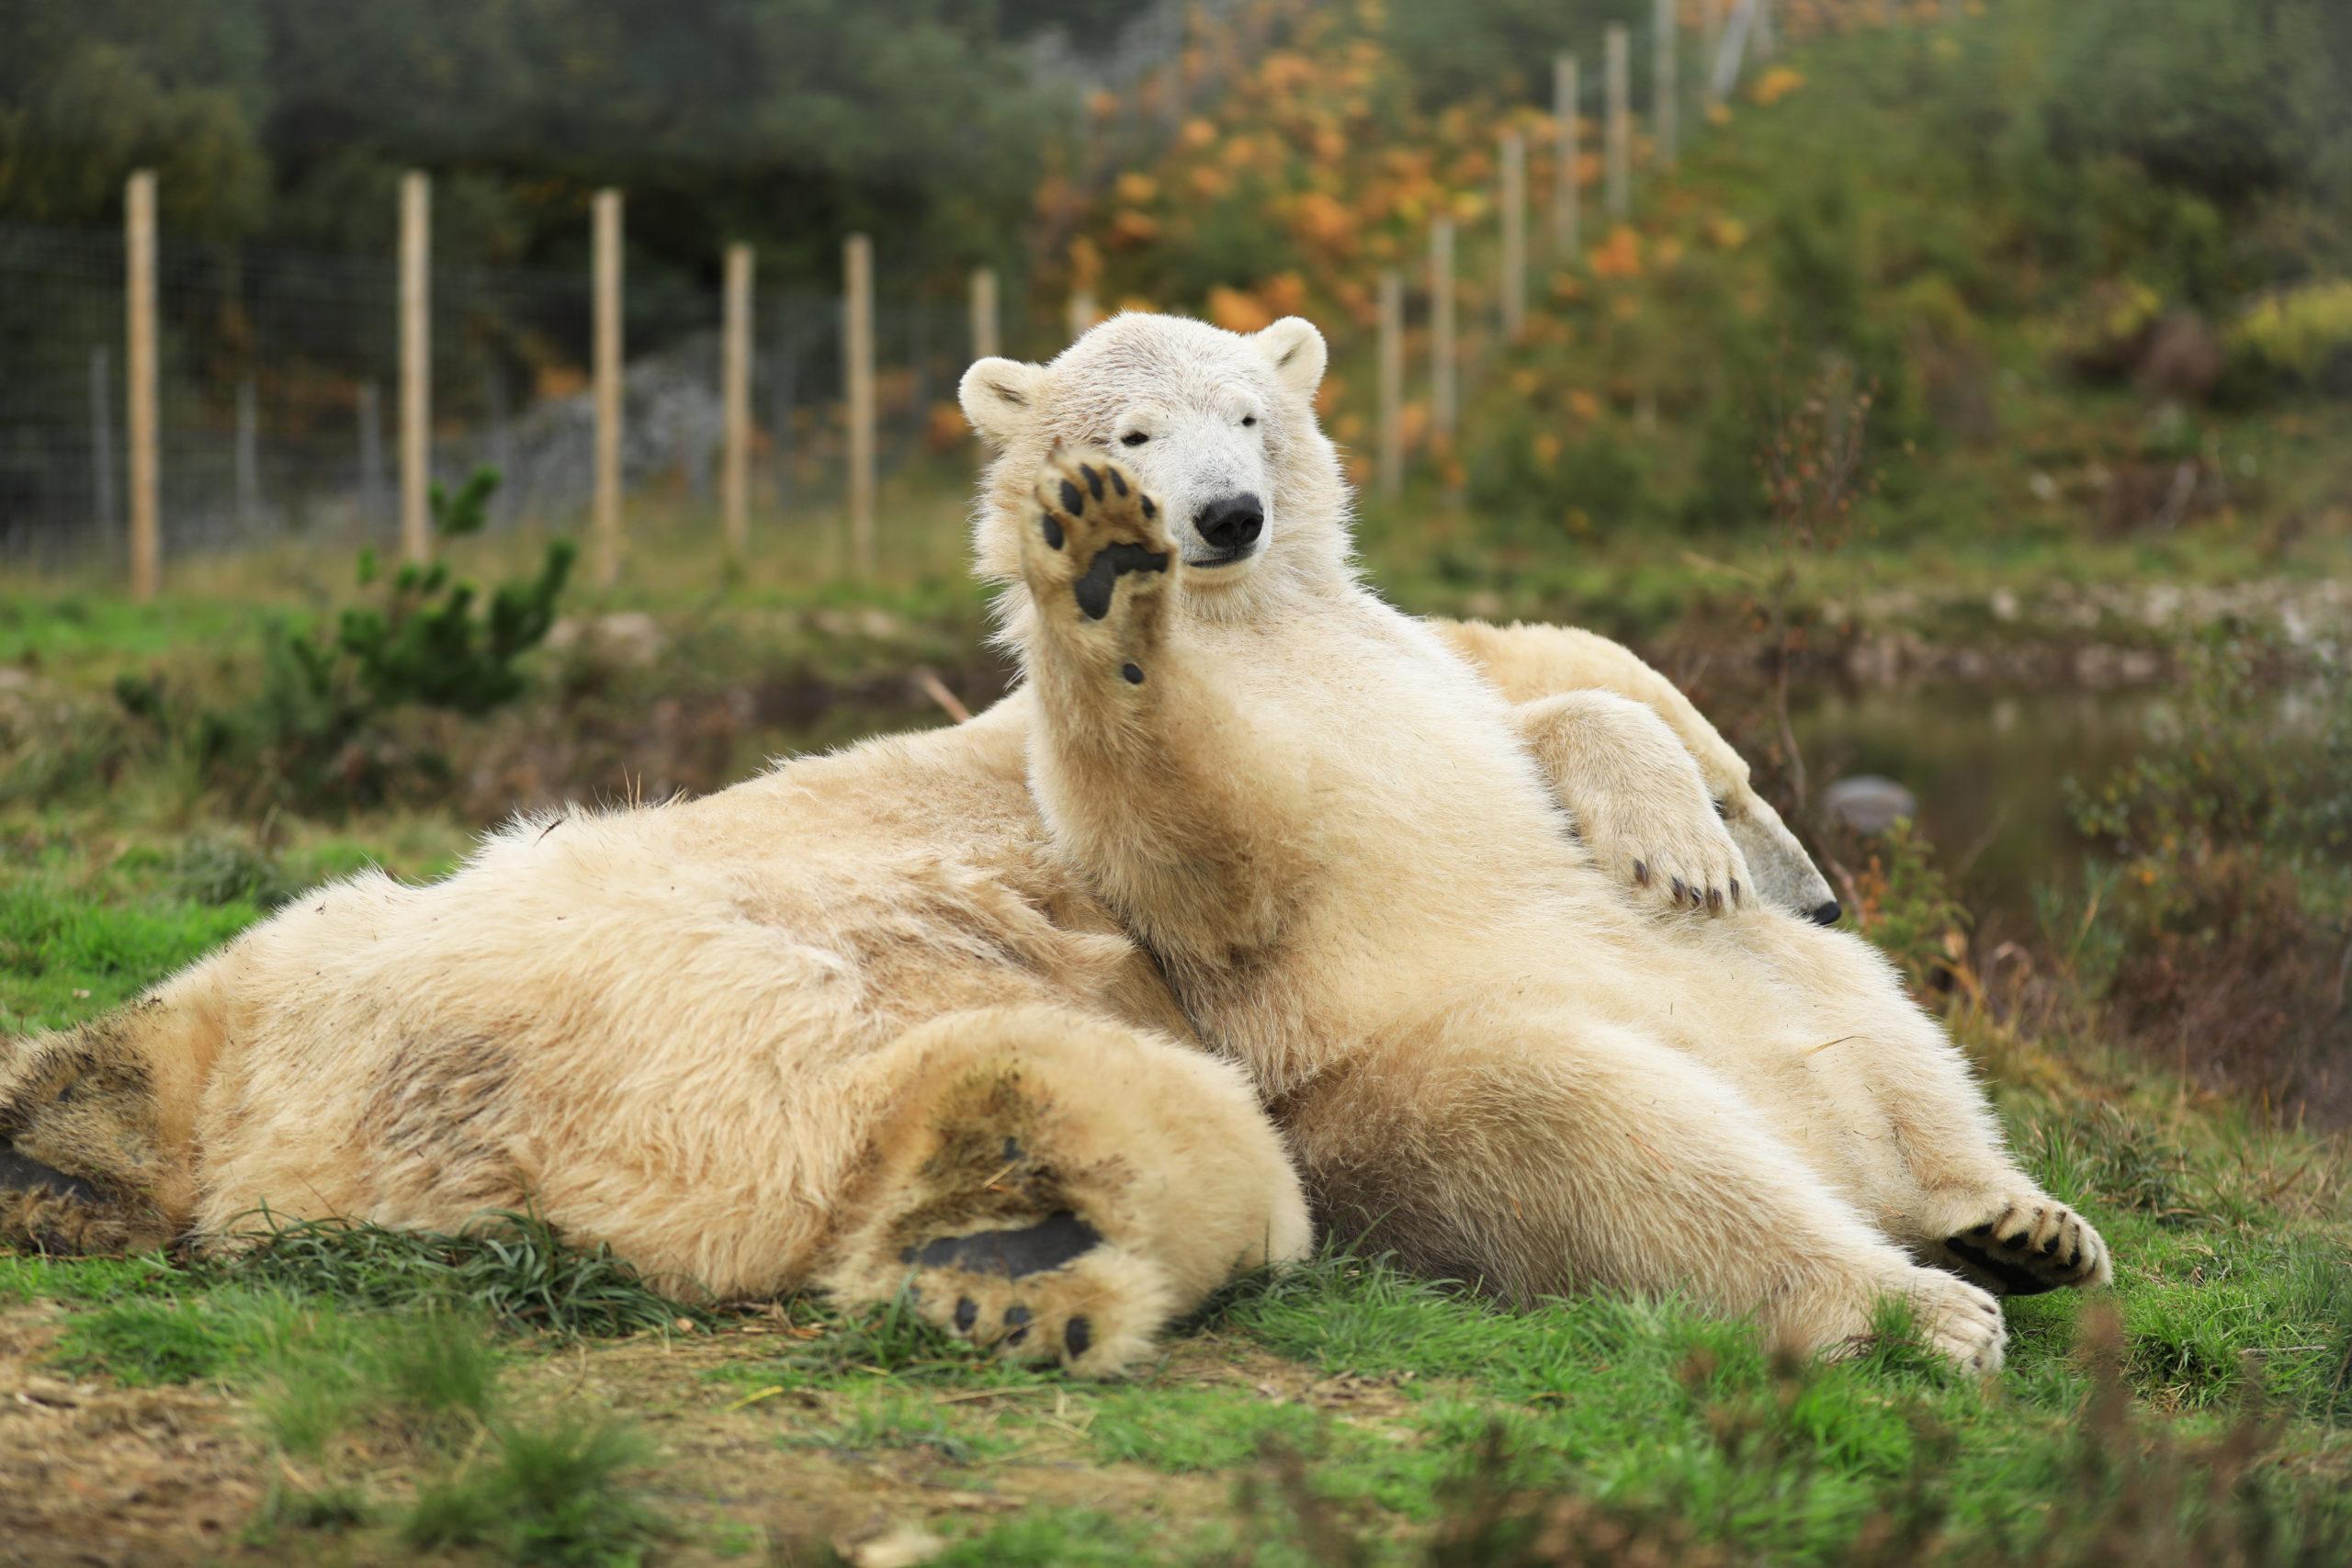 Hamish the polar bear waves to visitors at Highland Wildlife Park